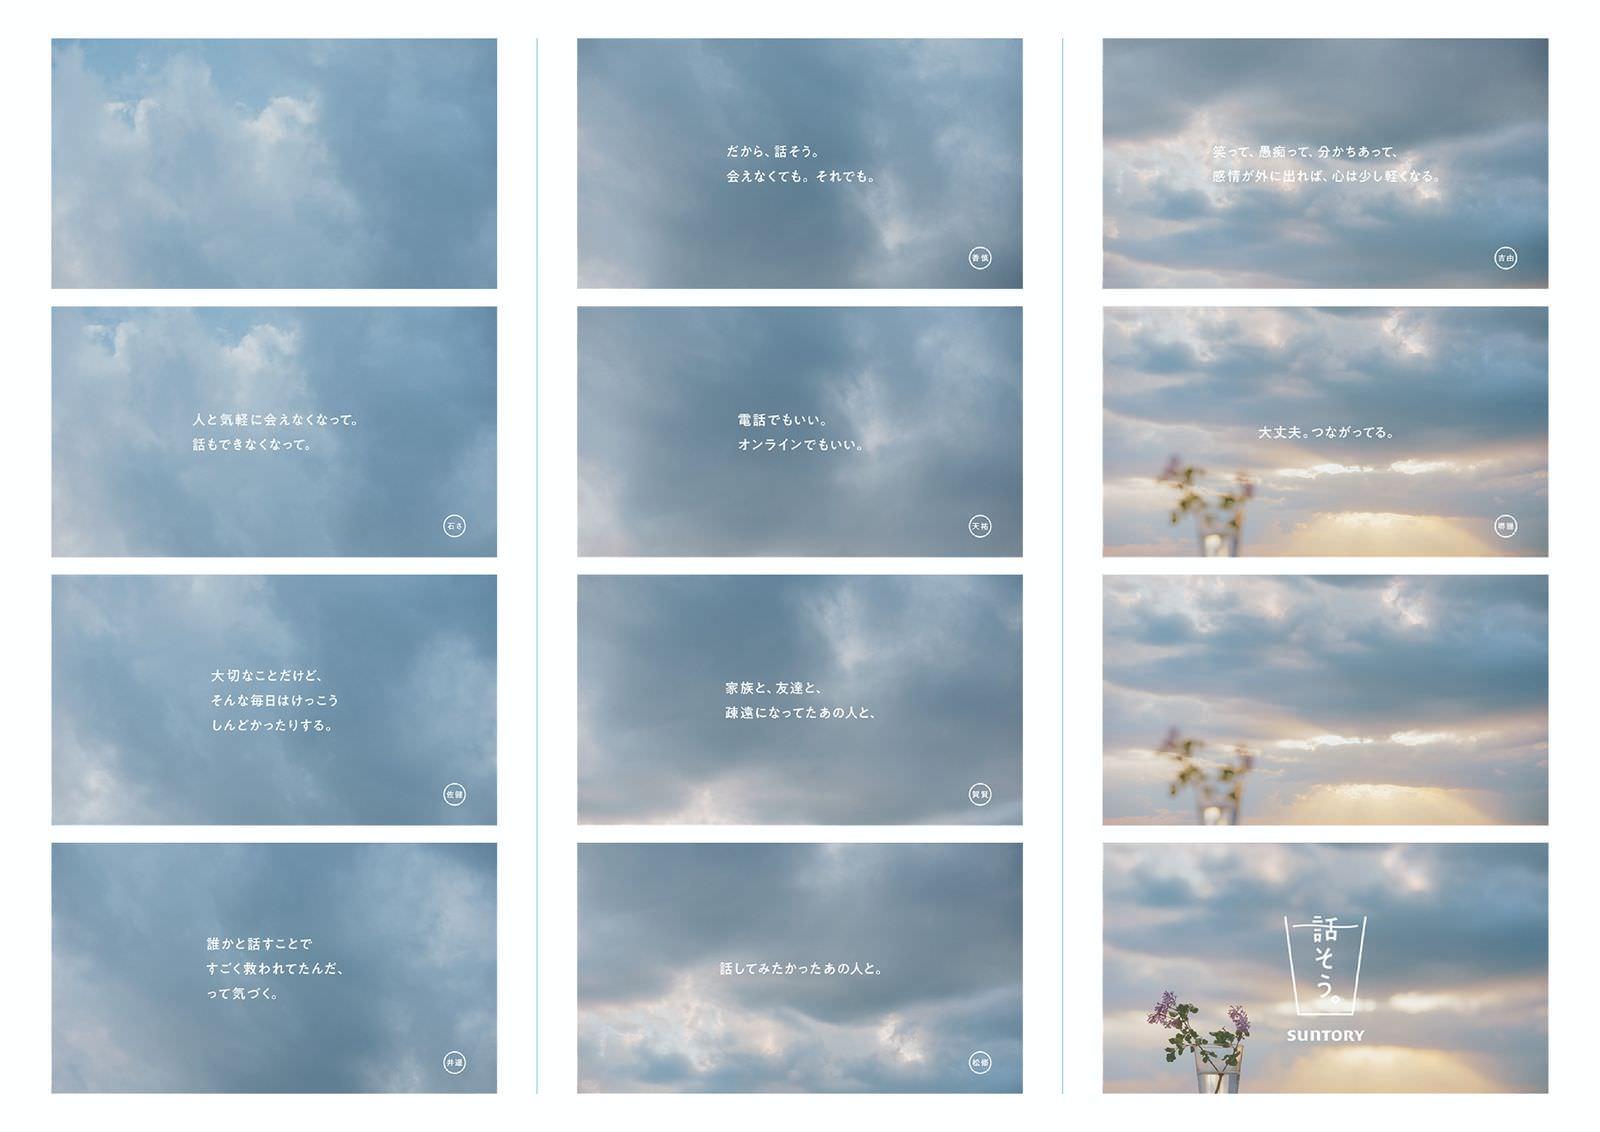 https://dentsulab.tokyo/works/wp-content/uploads/sites/3/2020/09/suntory_hanasou_3.jpeg